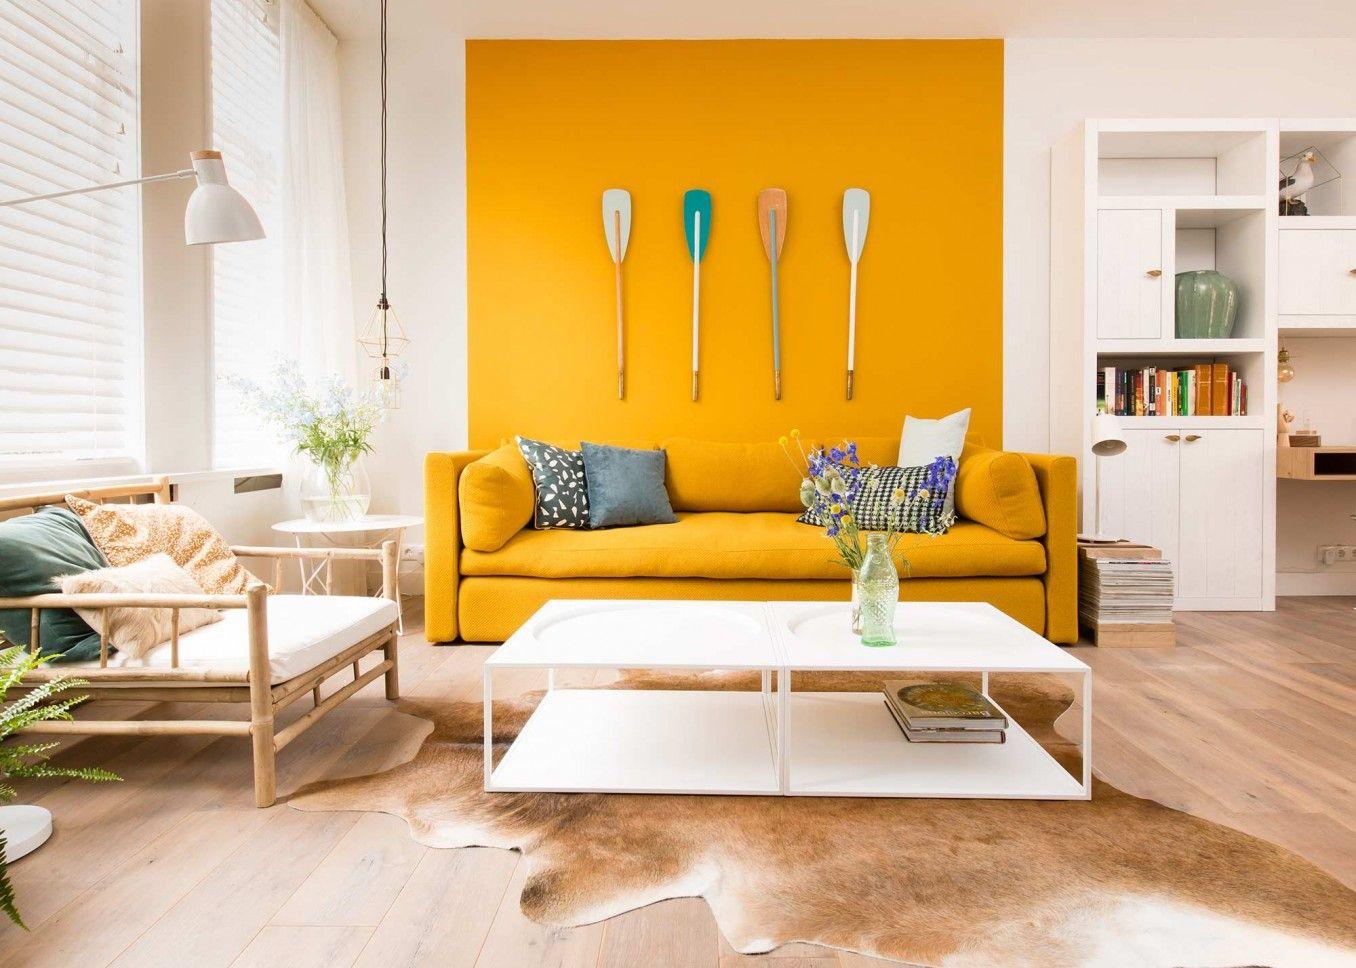 Gele bank en muur vtwonen - WOONKAMER | Pinterest - Gele bank ...